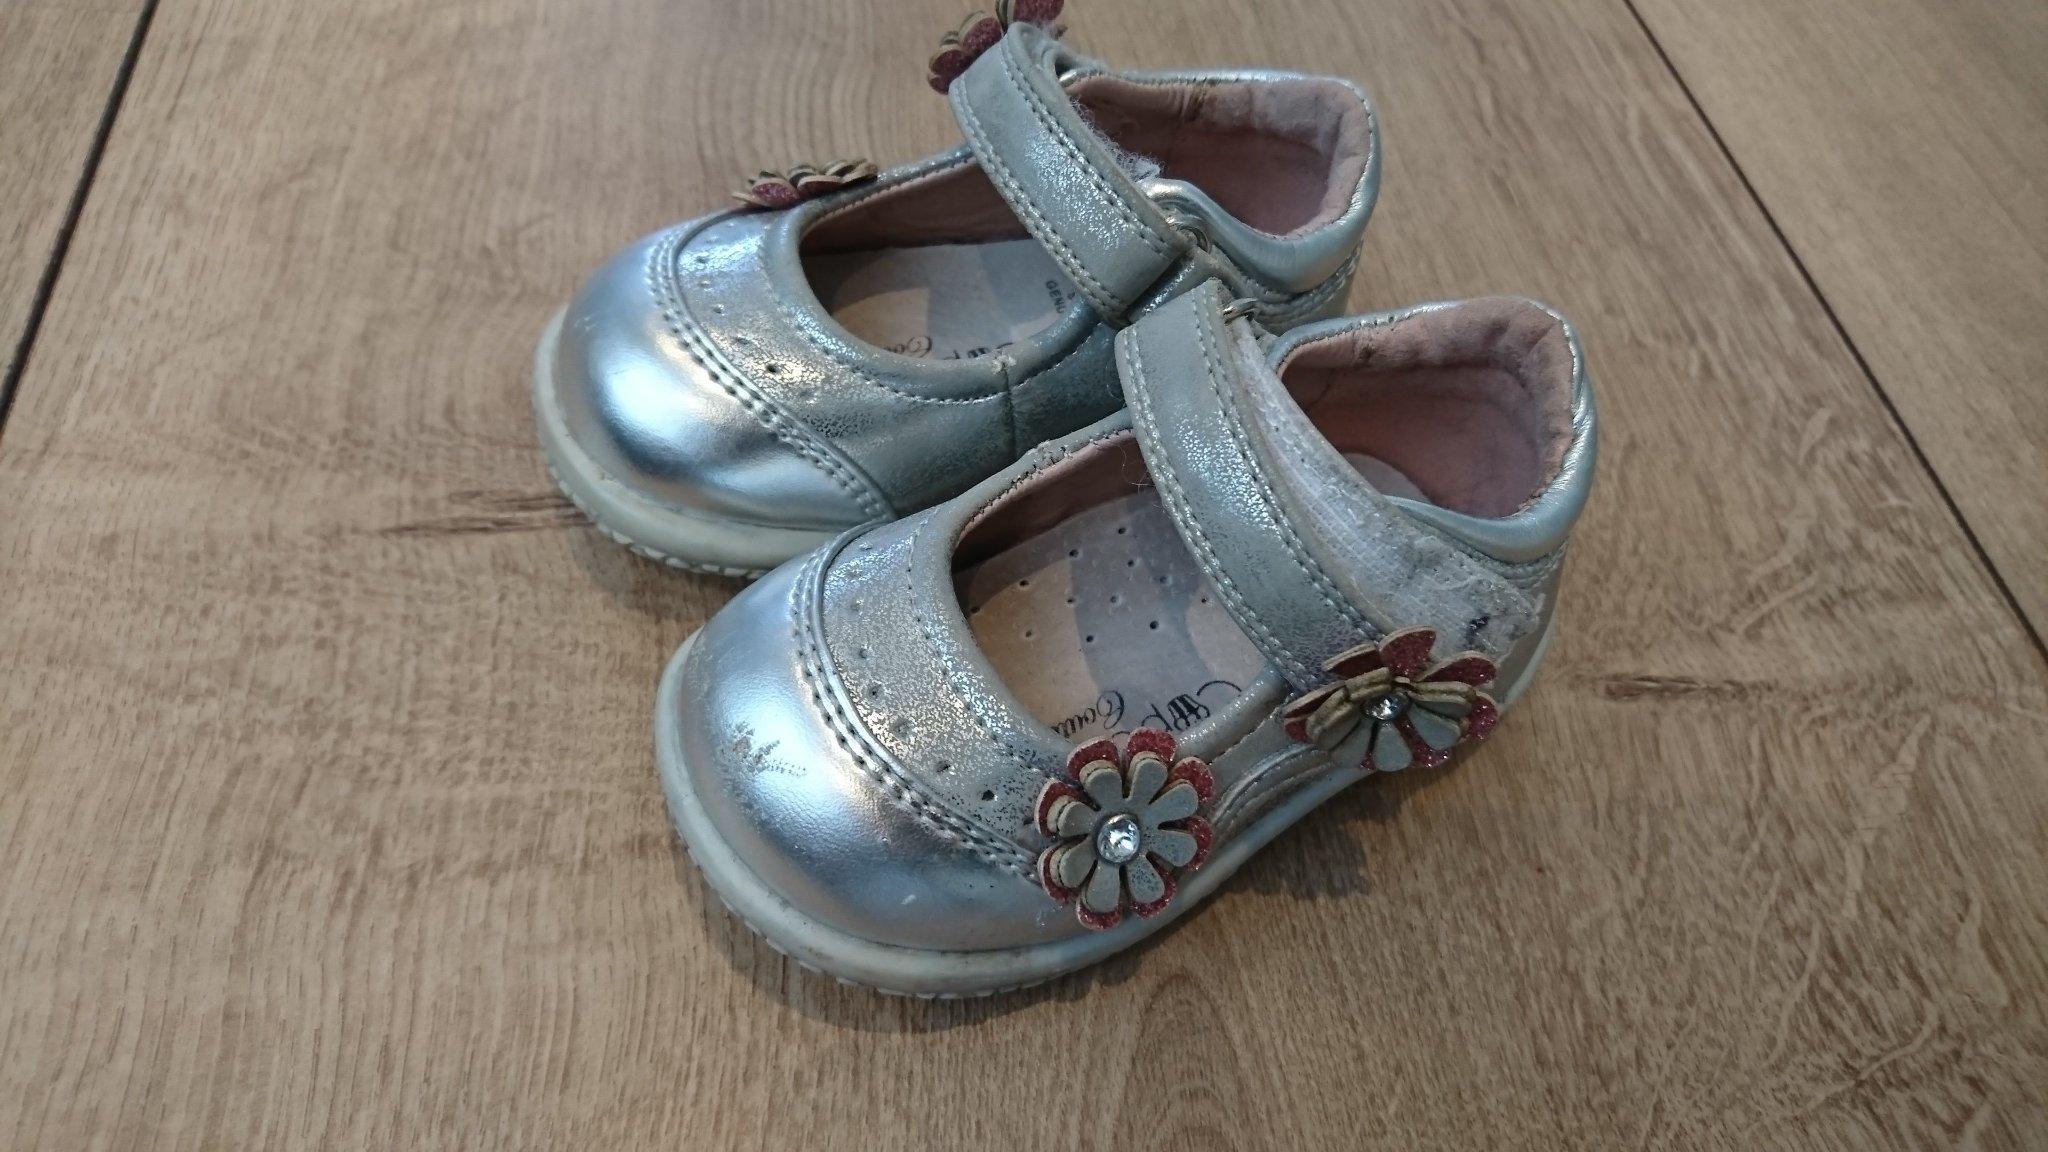 cd849ea31a7 Sandal /finskor i storlek 19 (352918471) ᐈ Köp på Tradera